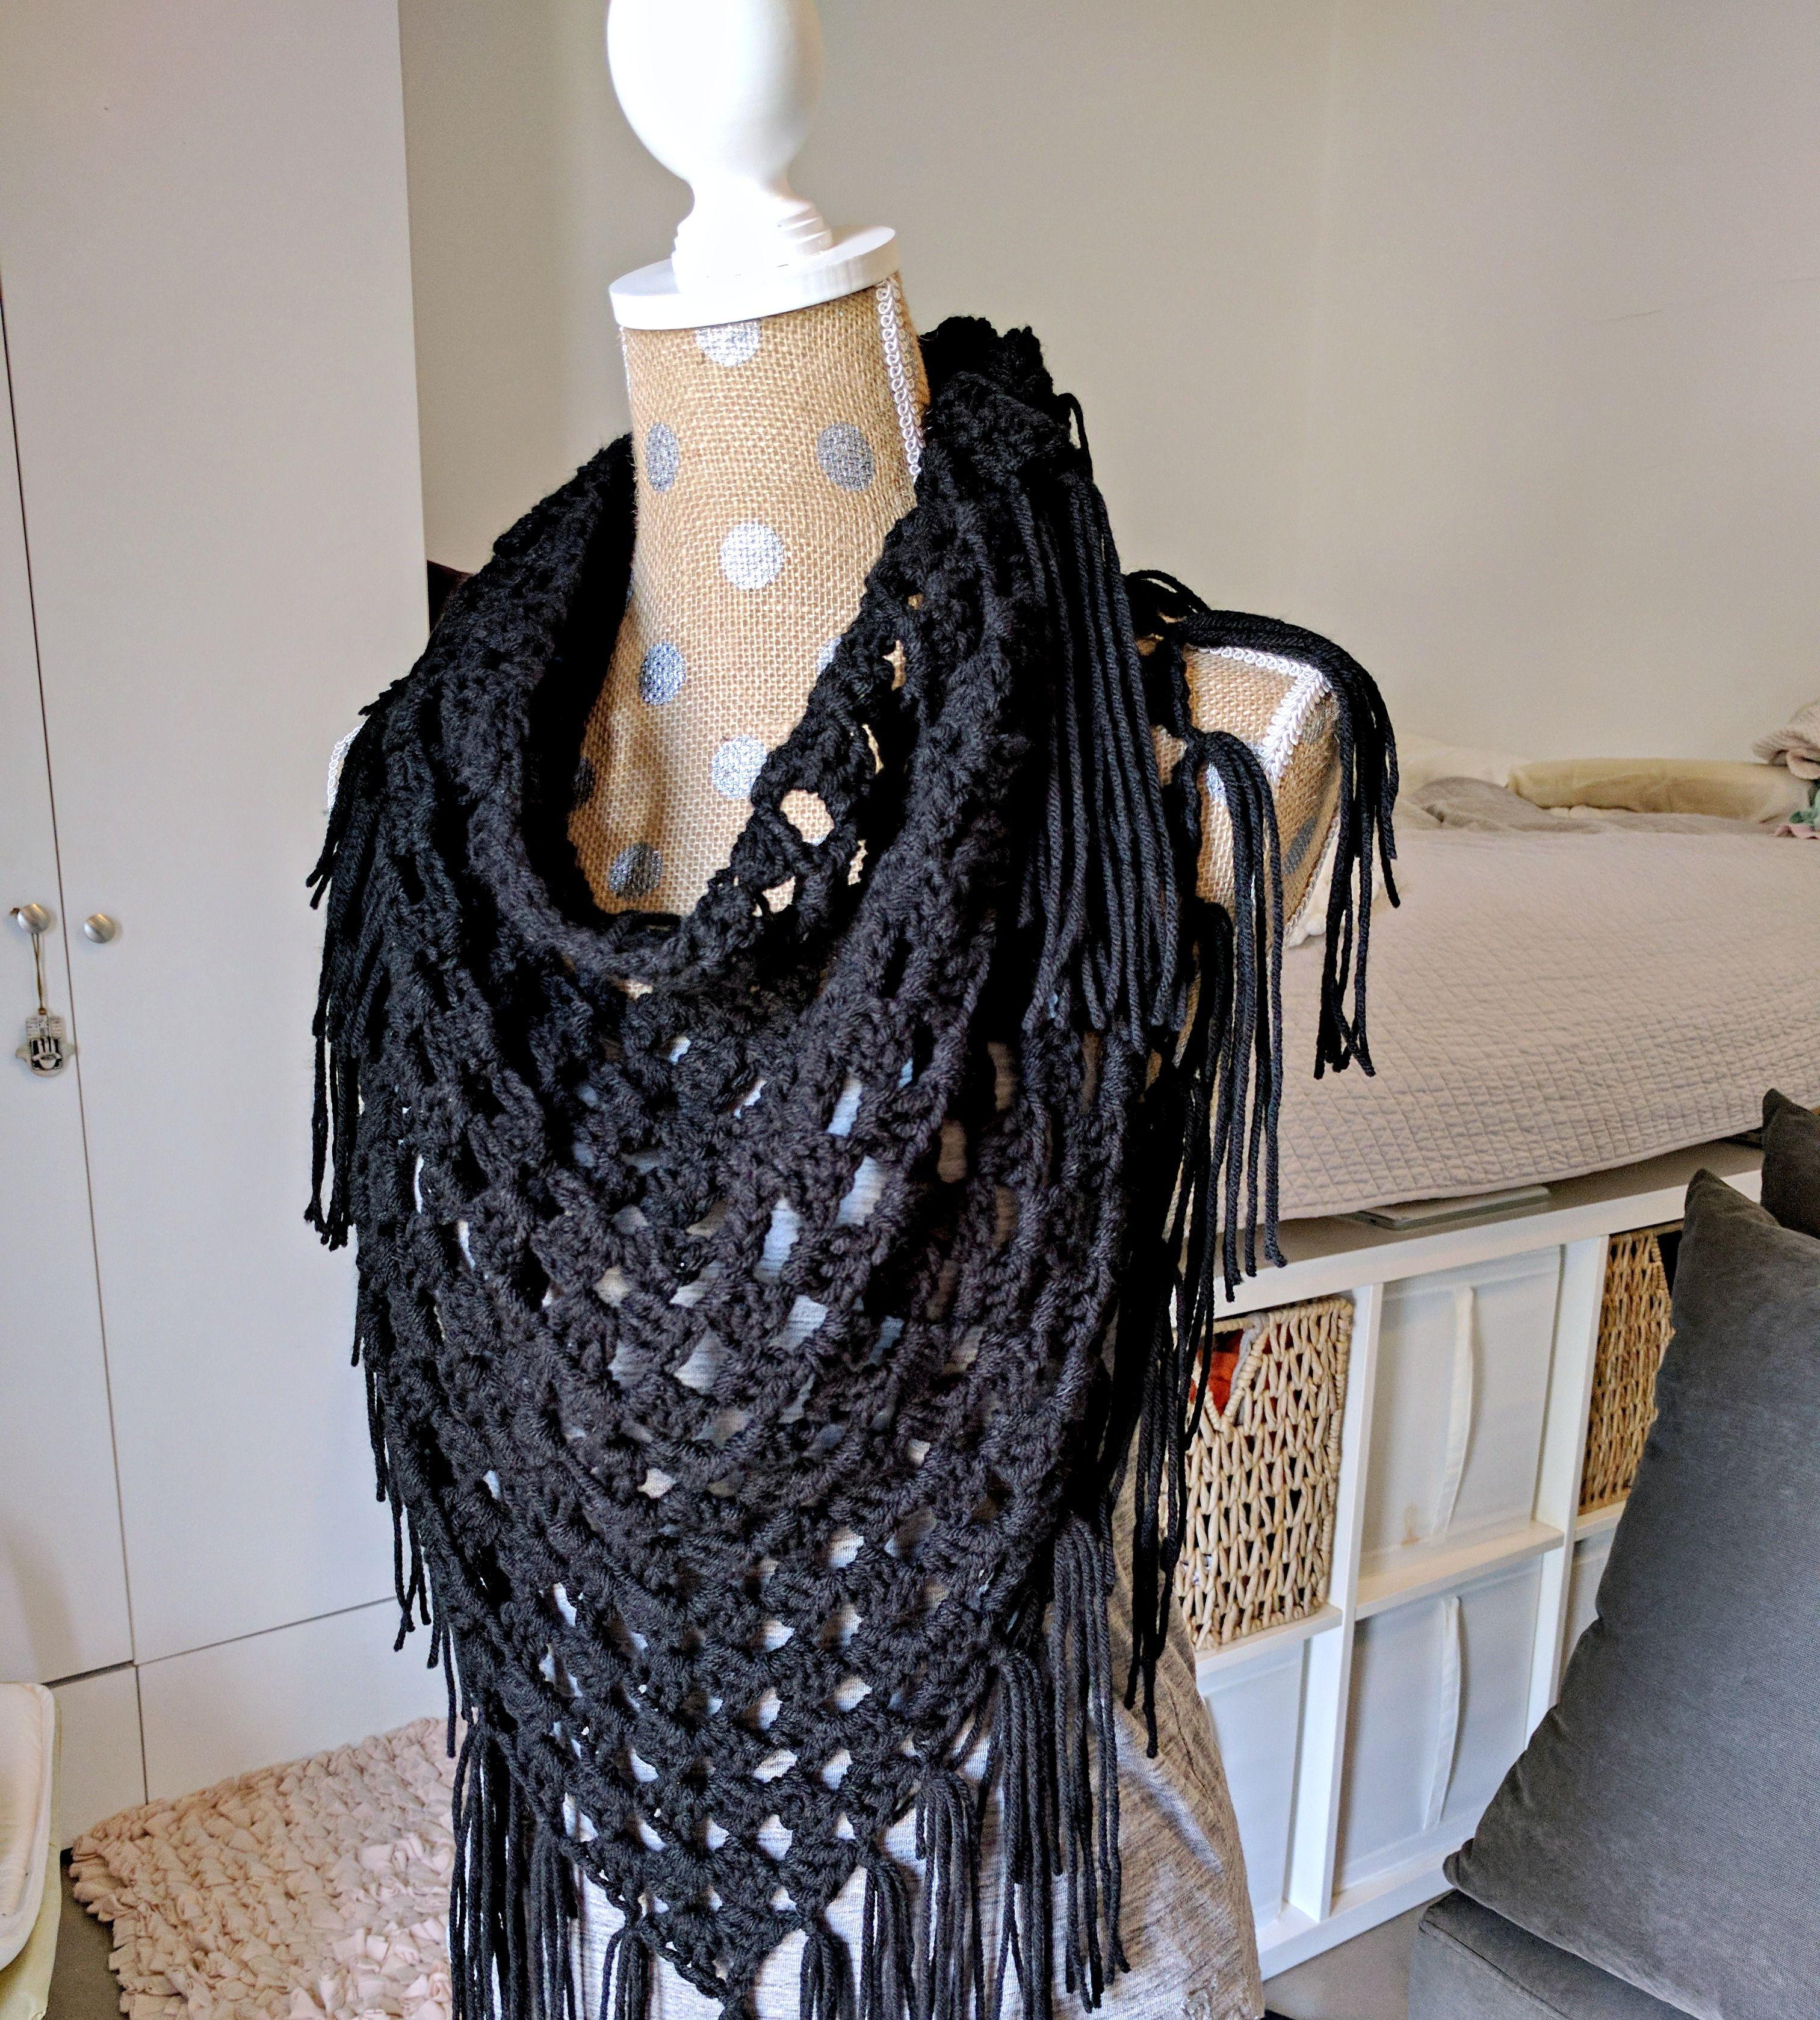 Pin de The Snugglery en Crochet and Knitting | Pinterest